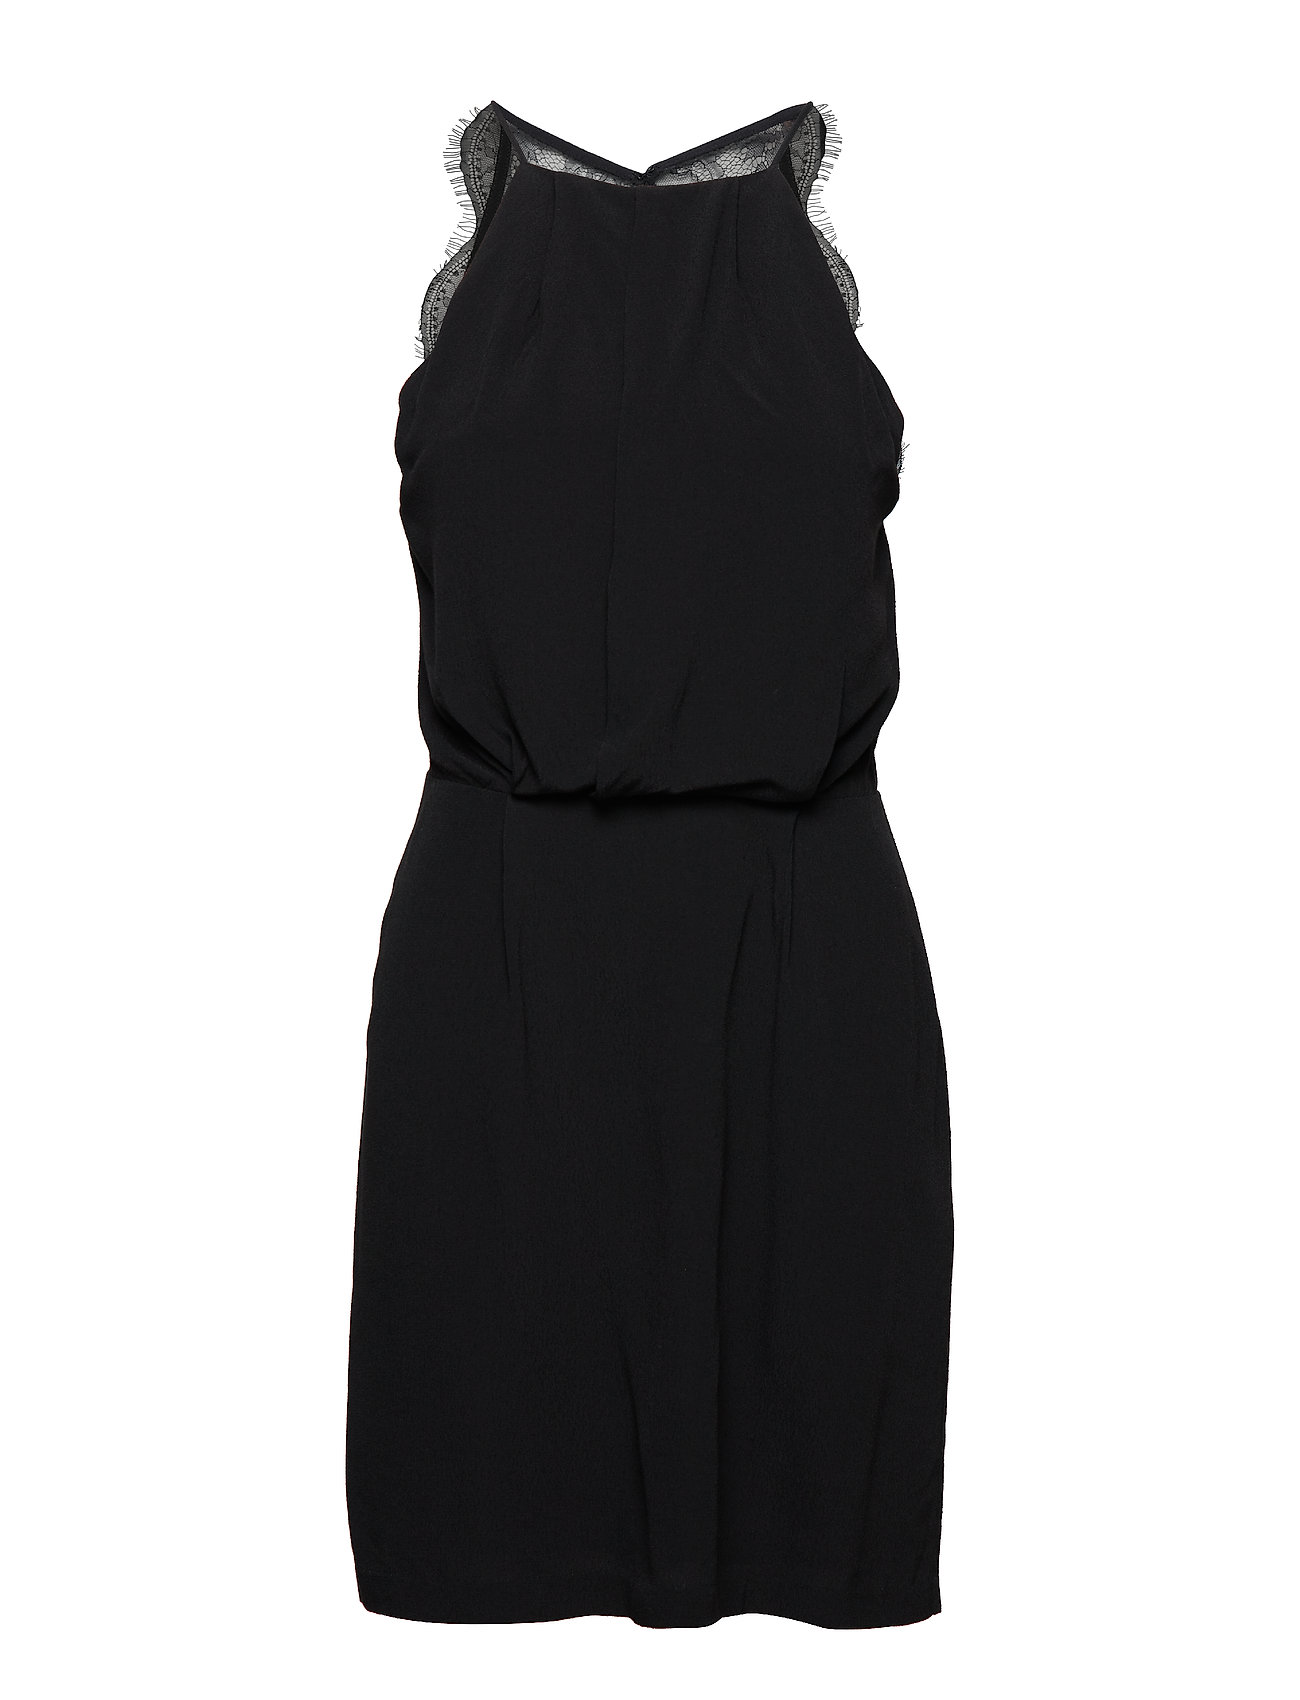 c7d078d8e127 Willow Short Dress 5687 (Black) (600 kr) - Samsøe   Samsøe -